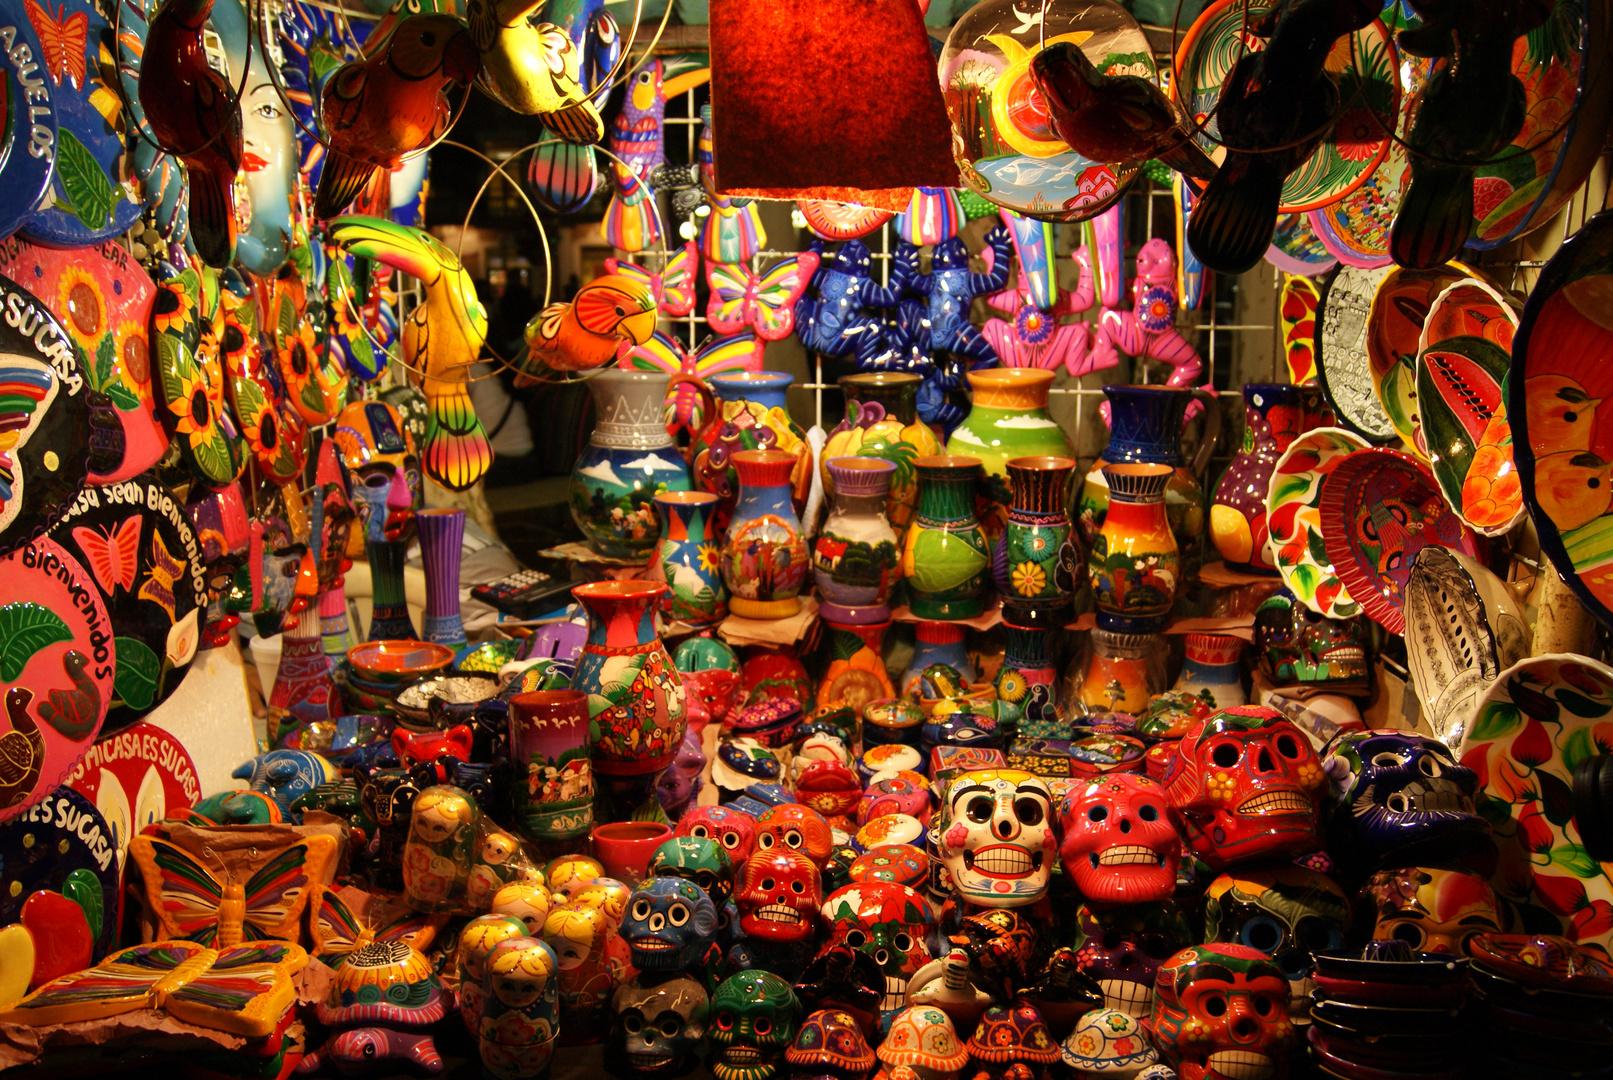 Un poco de cultura mexicana